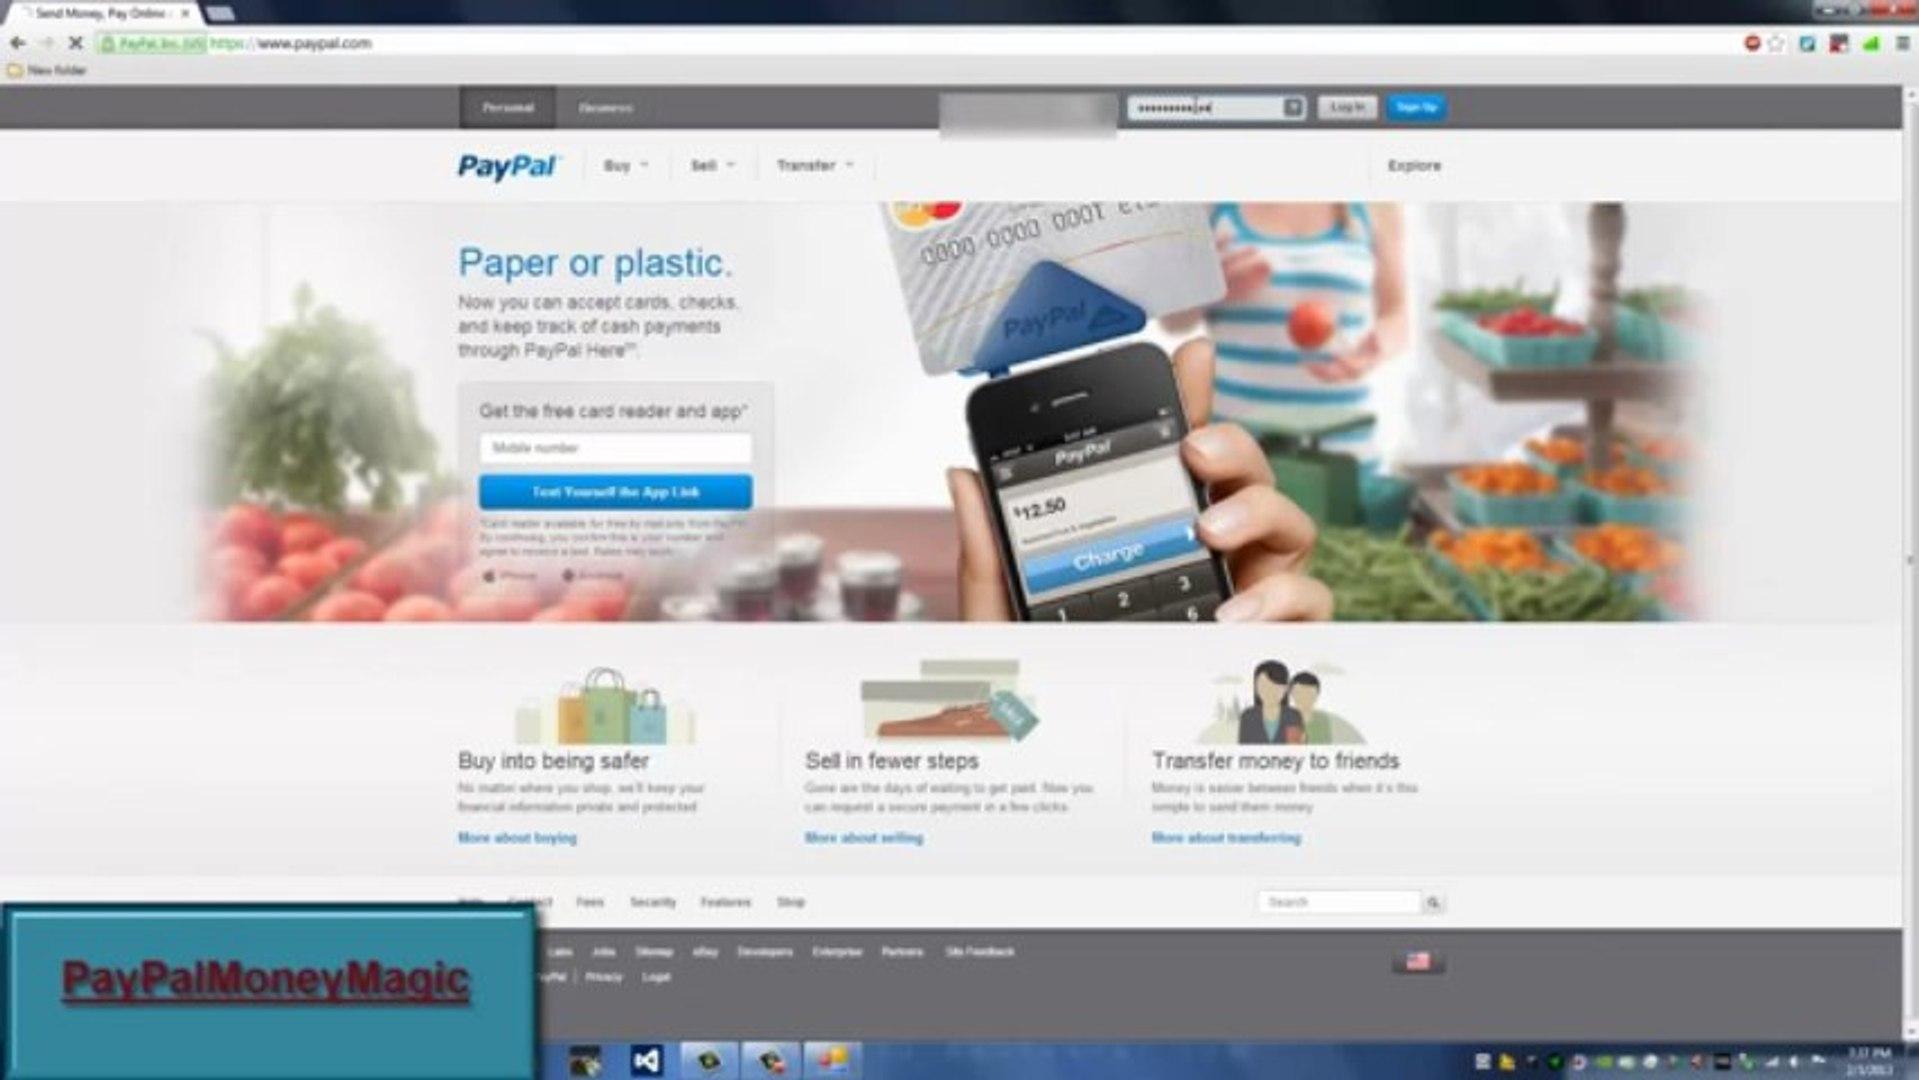 [PayPal Money Adder] Download New PayPal Money Adder 2013 Free [v4.65]